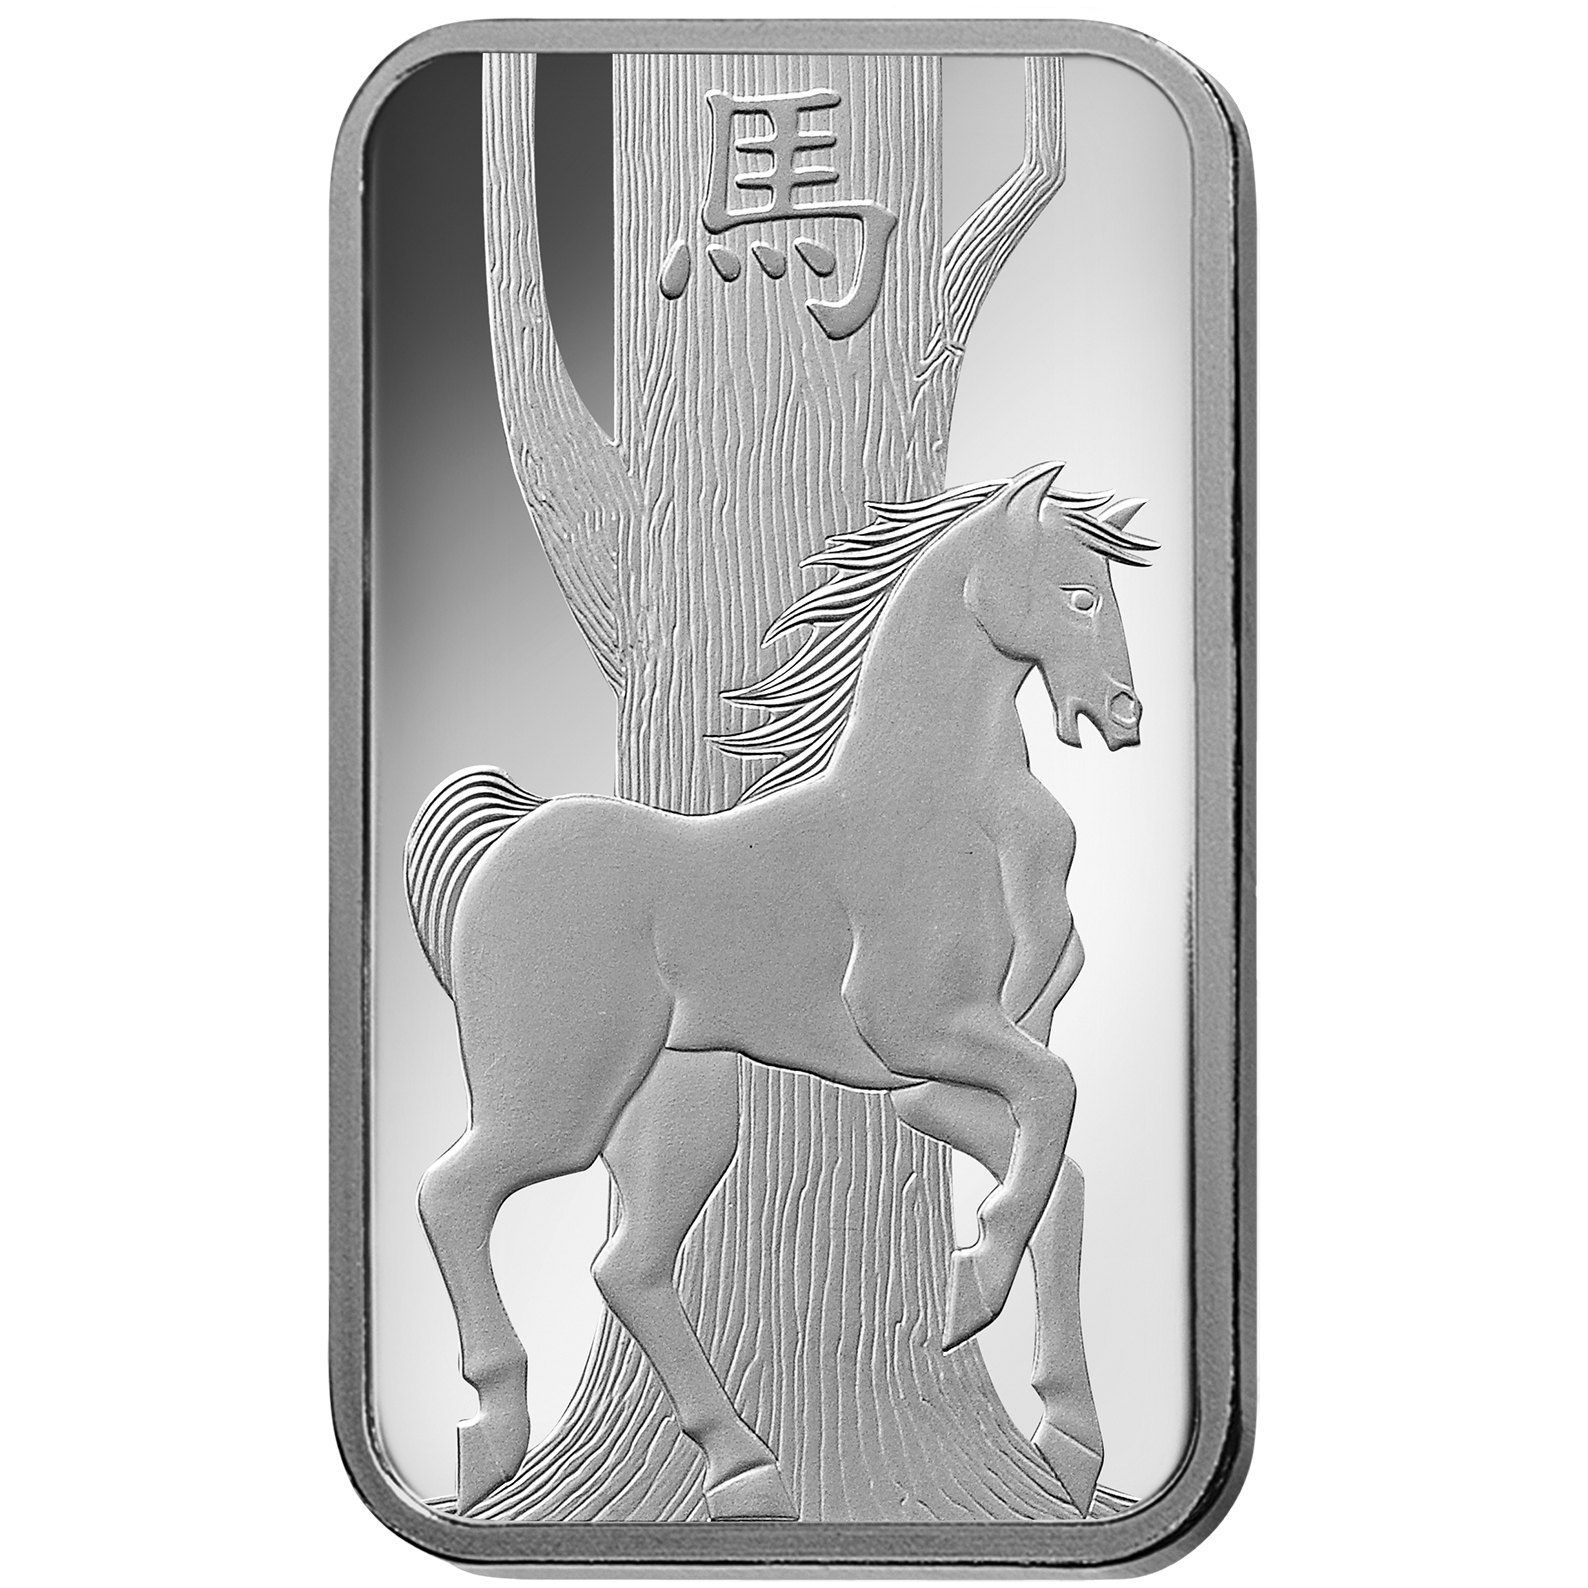 1 oz Silver Bar - PAMP Suisse Lunar Horse